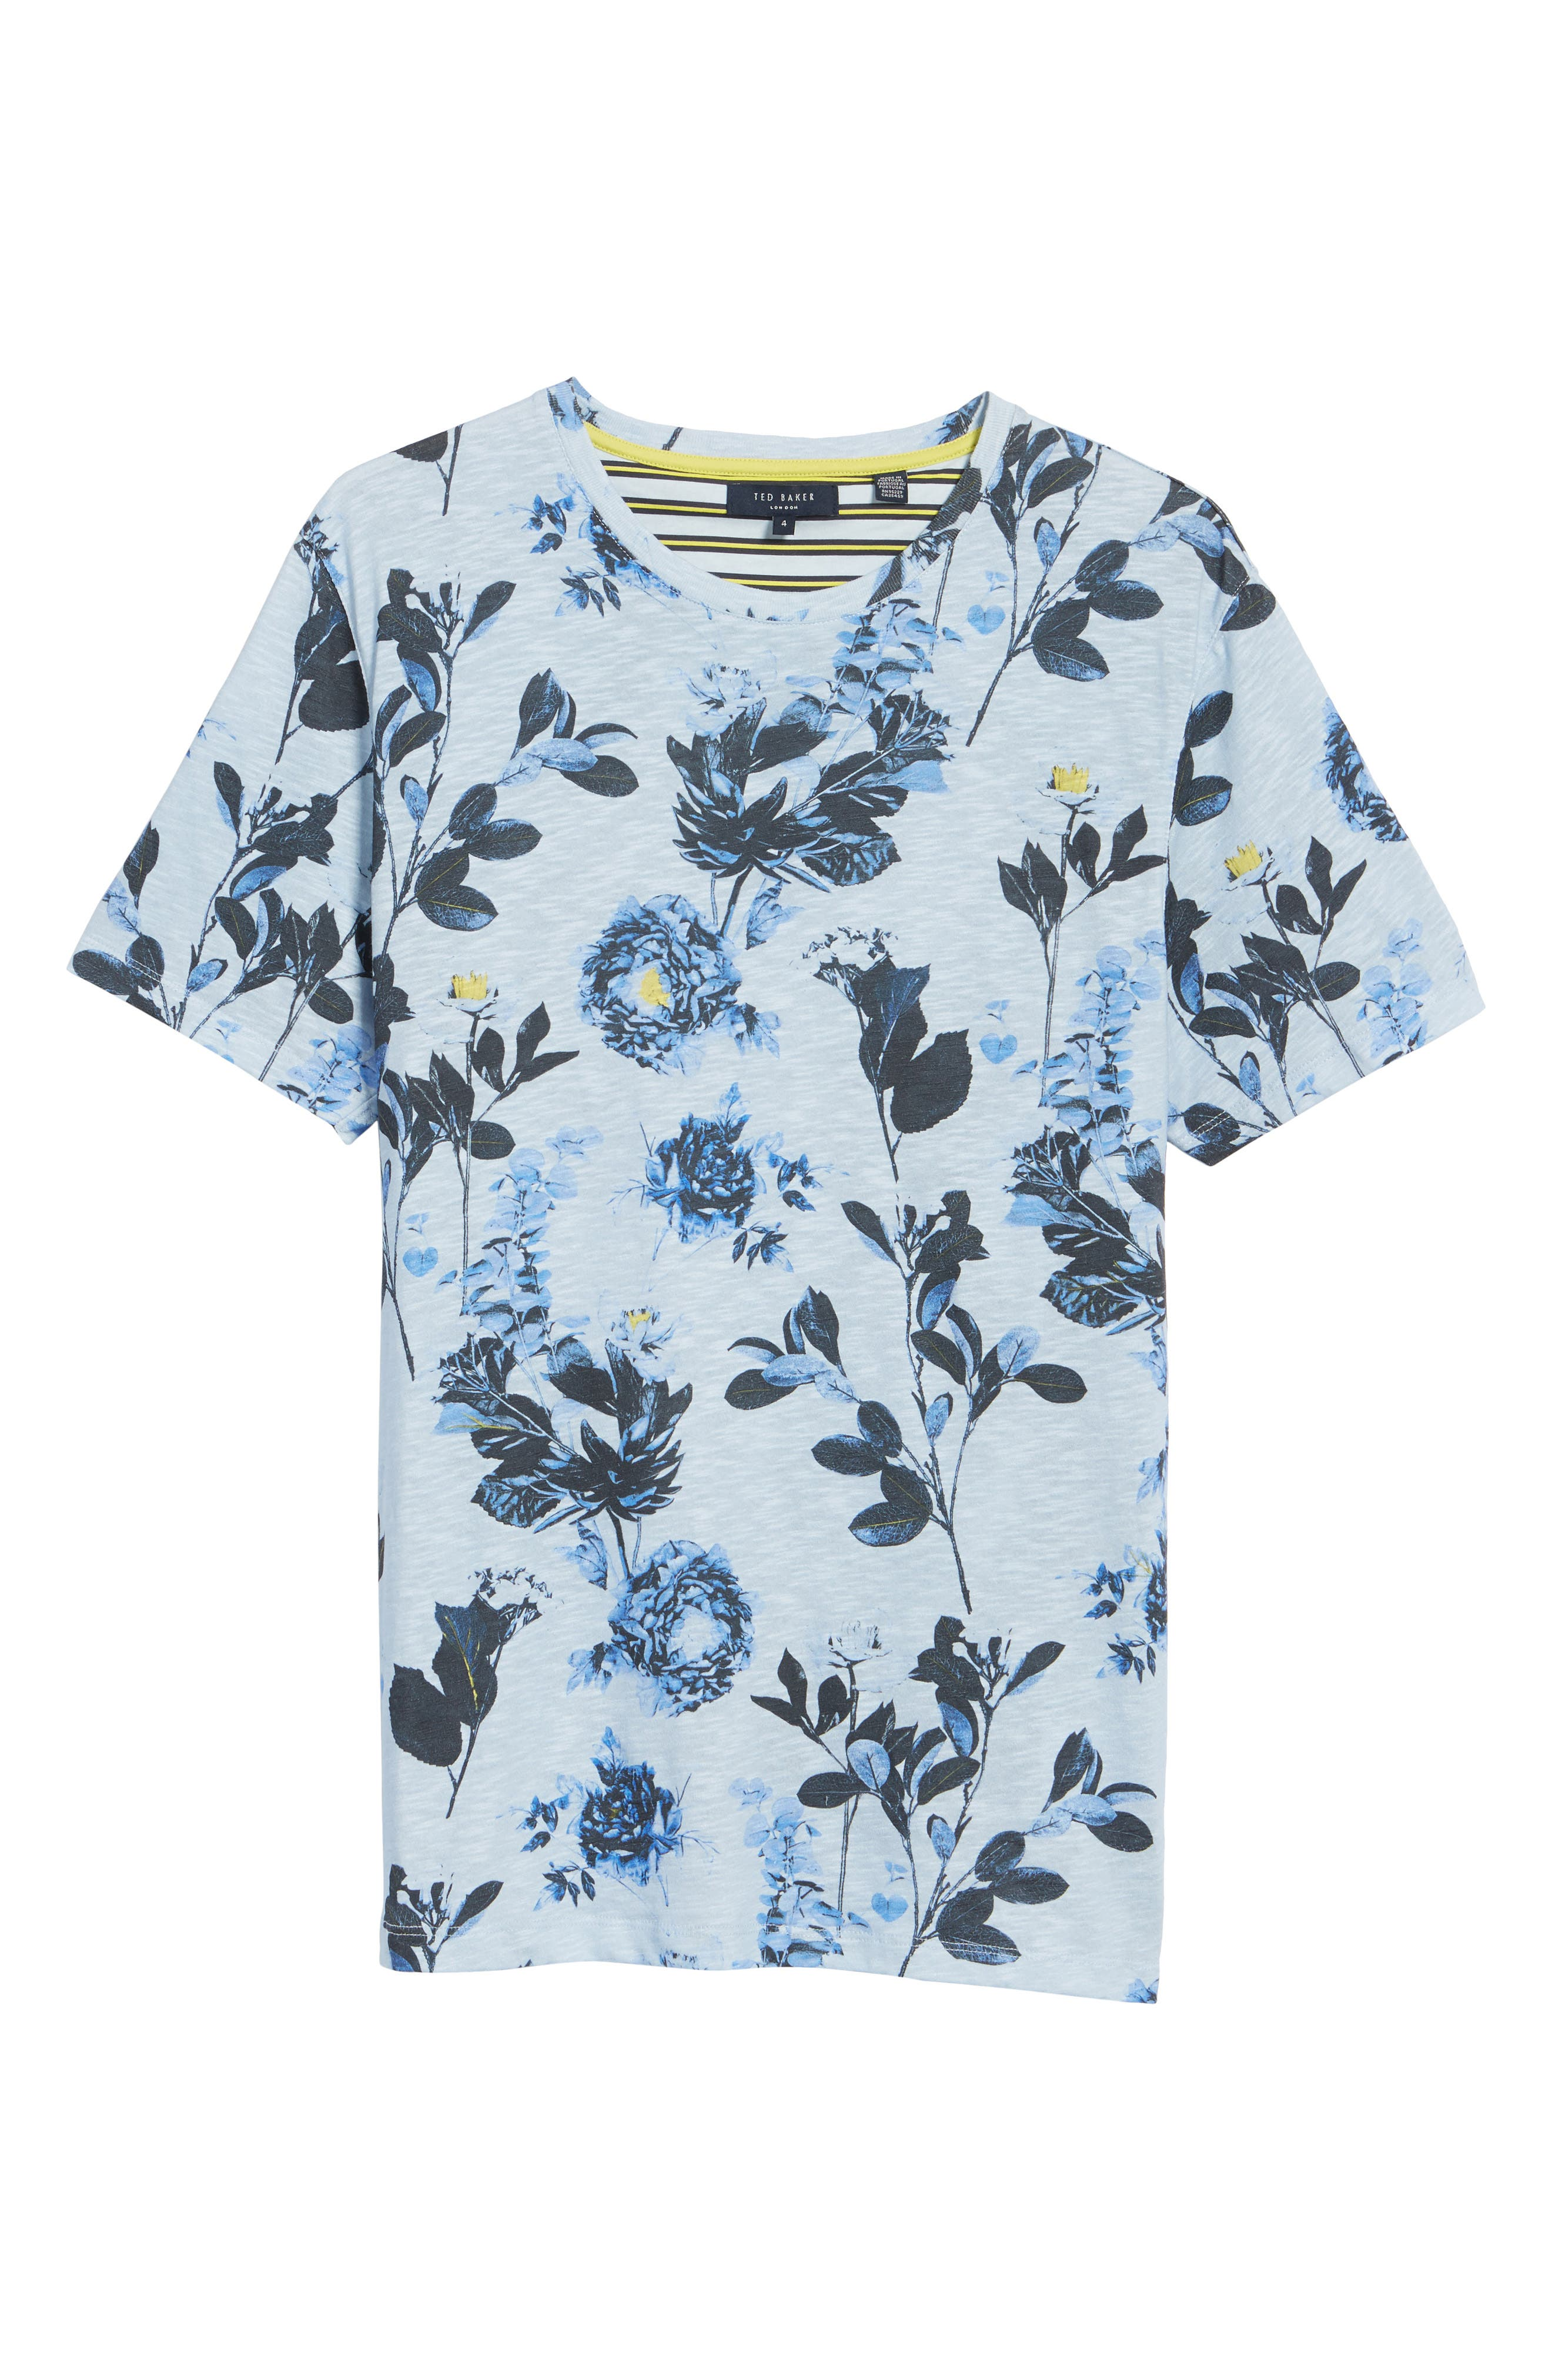 Doberma Trim Fit Floral Print T-Shirt,                             Alternate thumbnail 12, color,